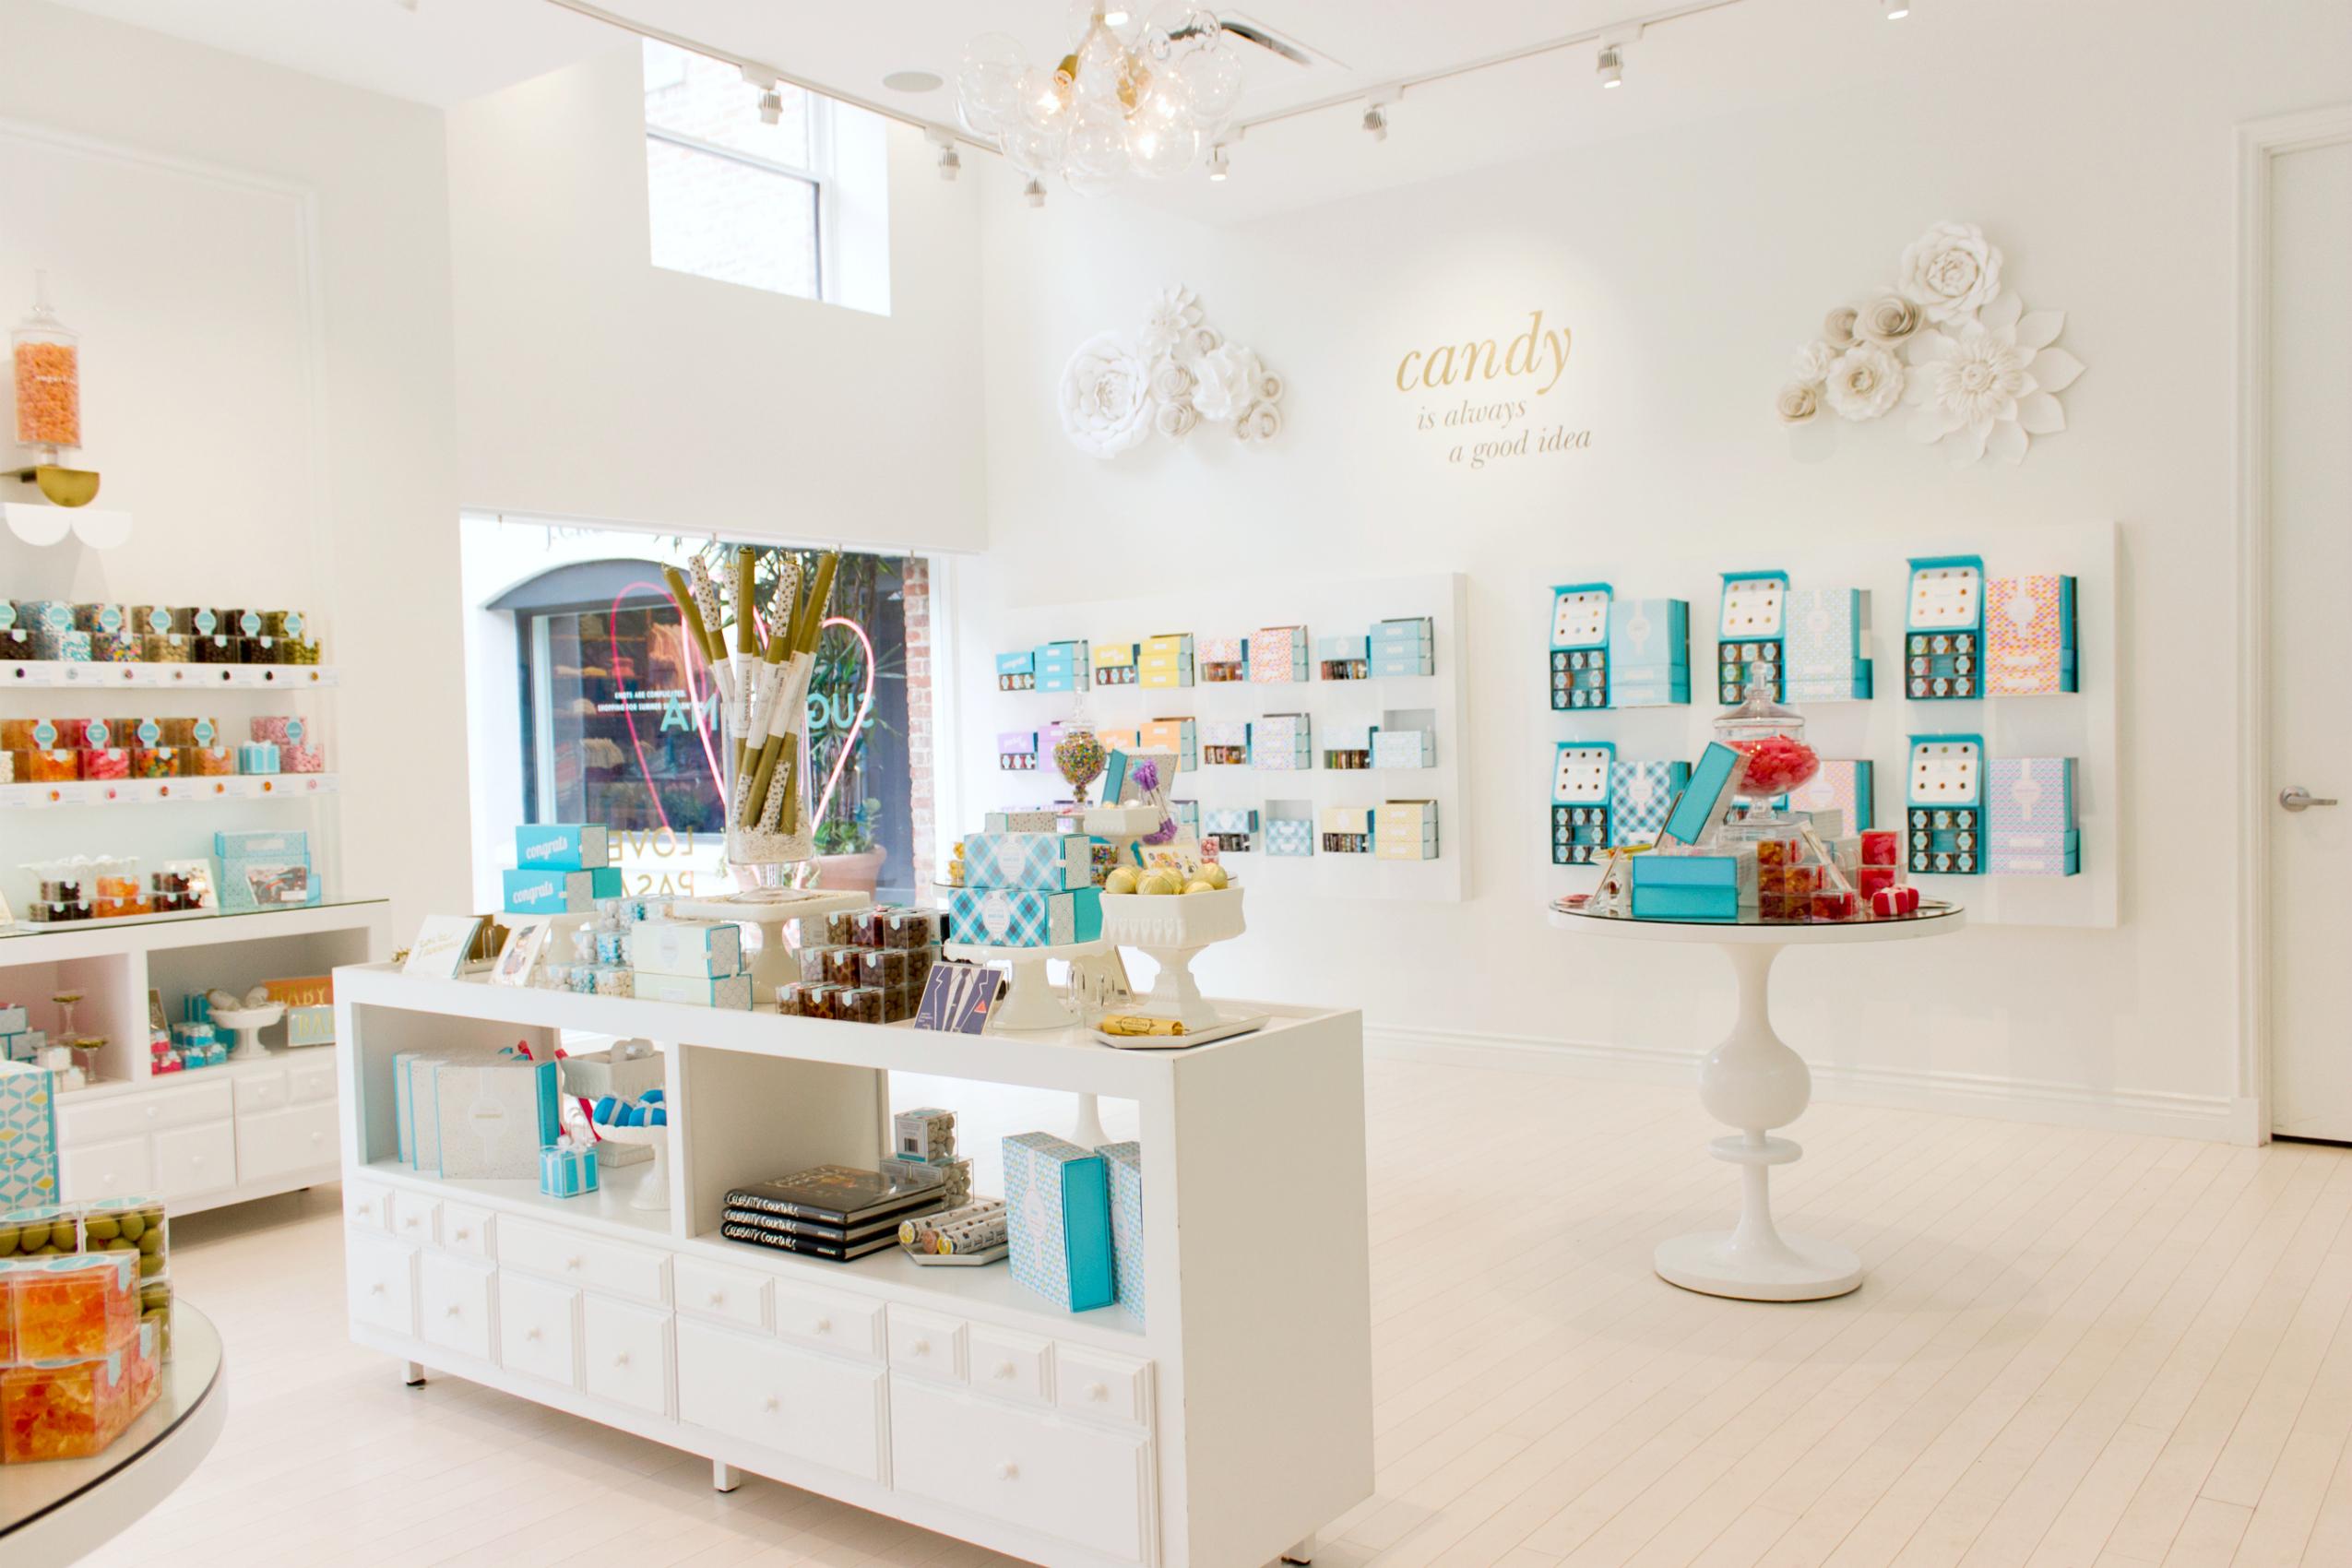 Sugarfina-Candy-Store-Pasadena